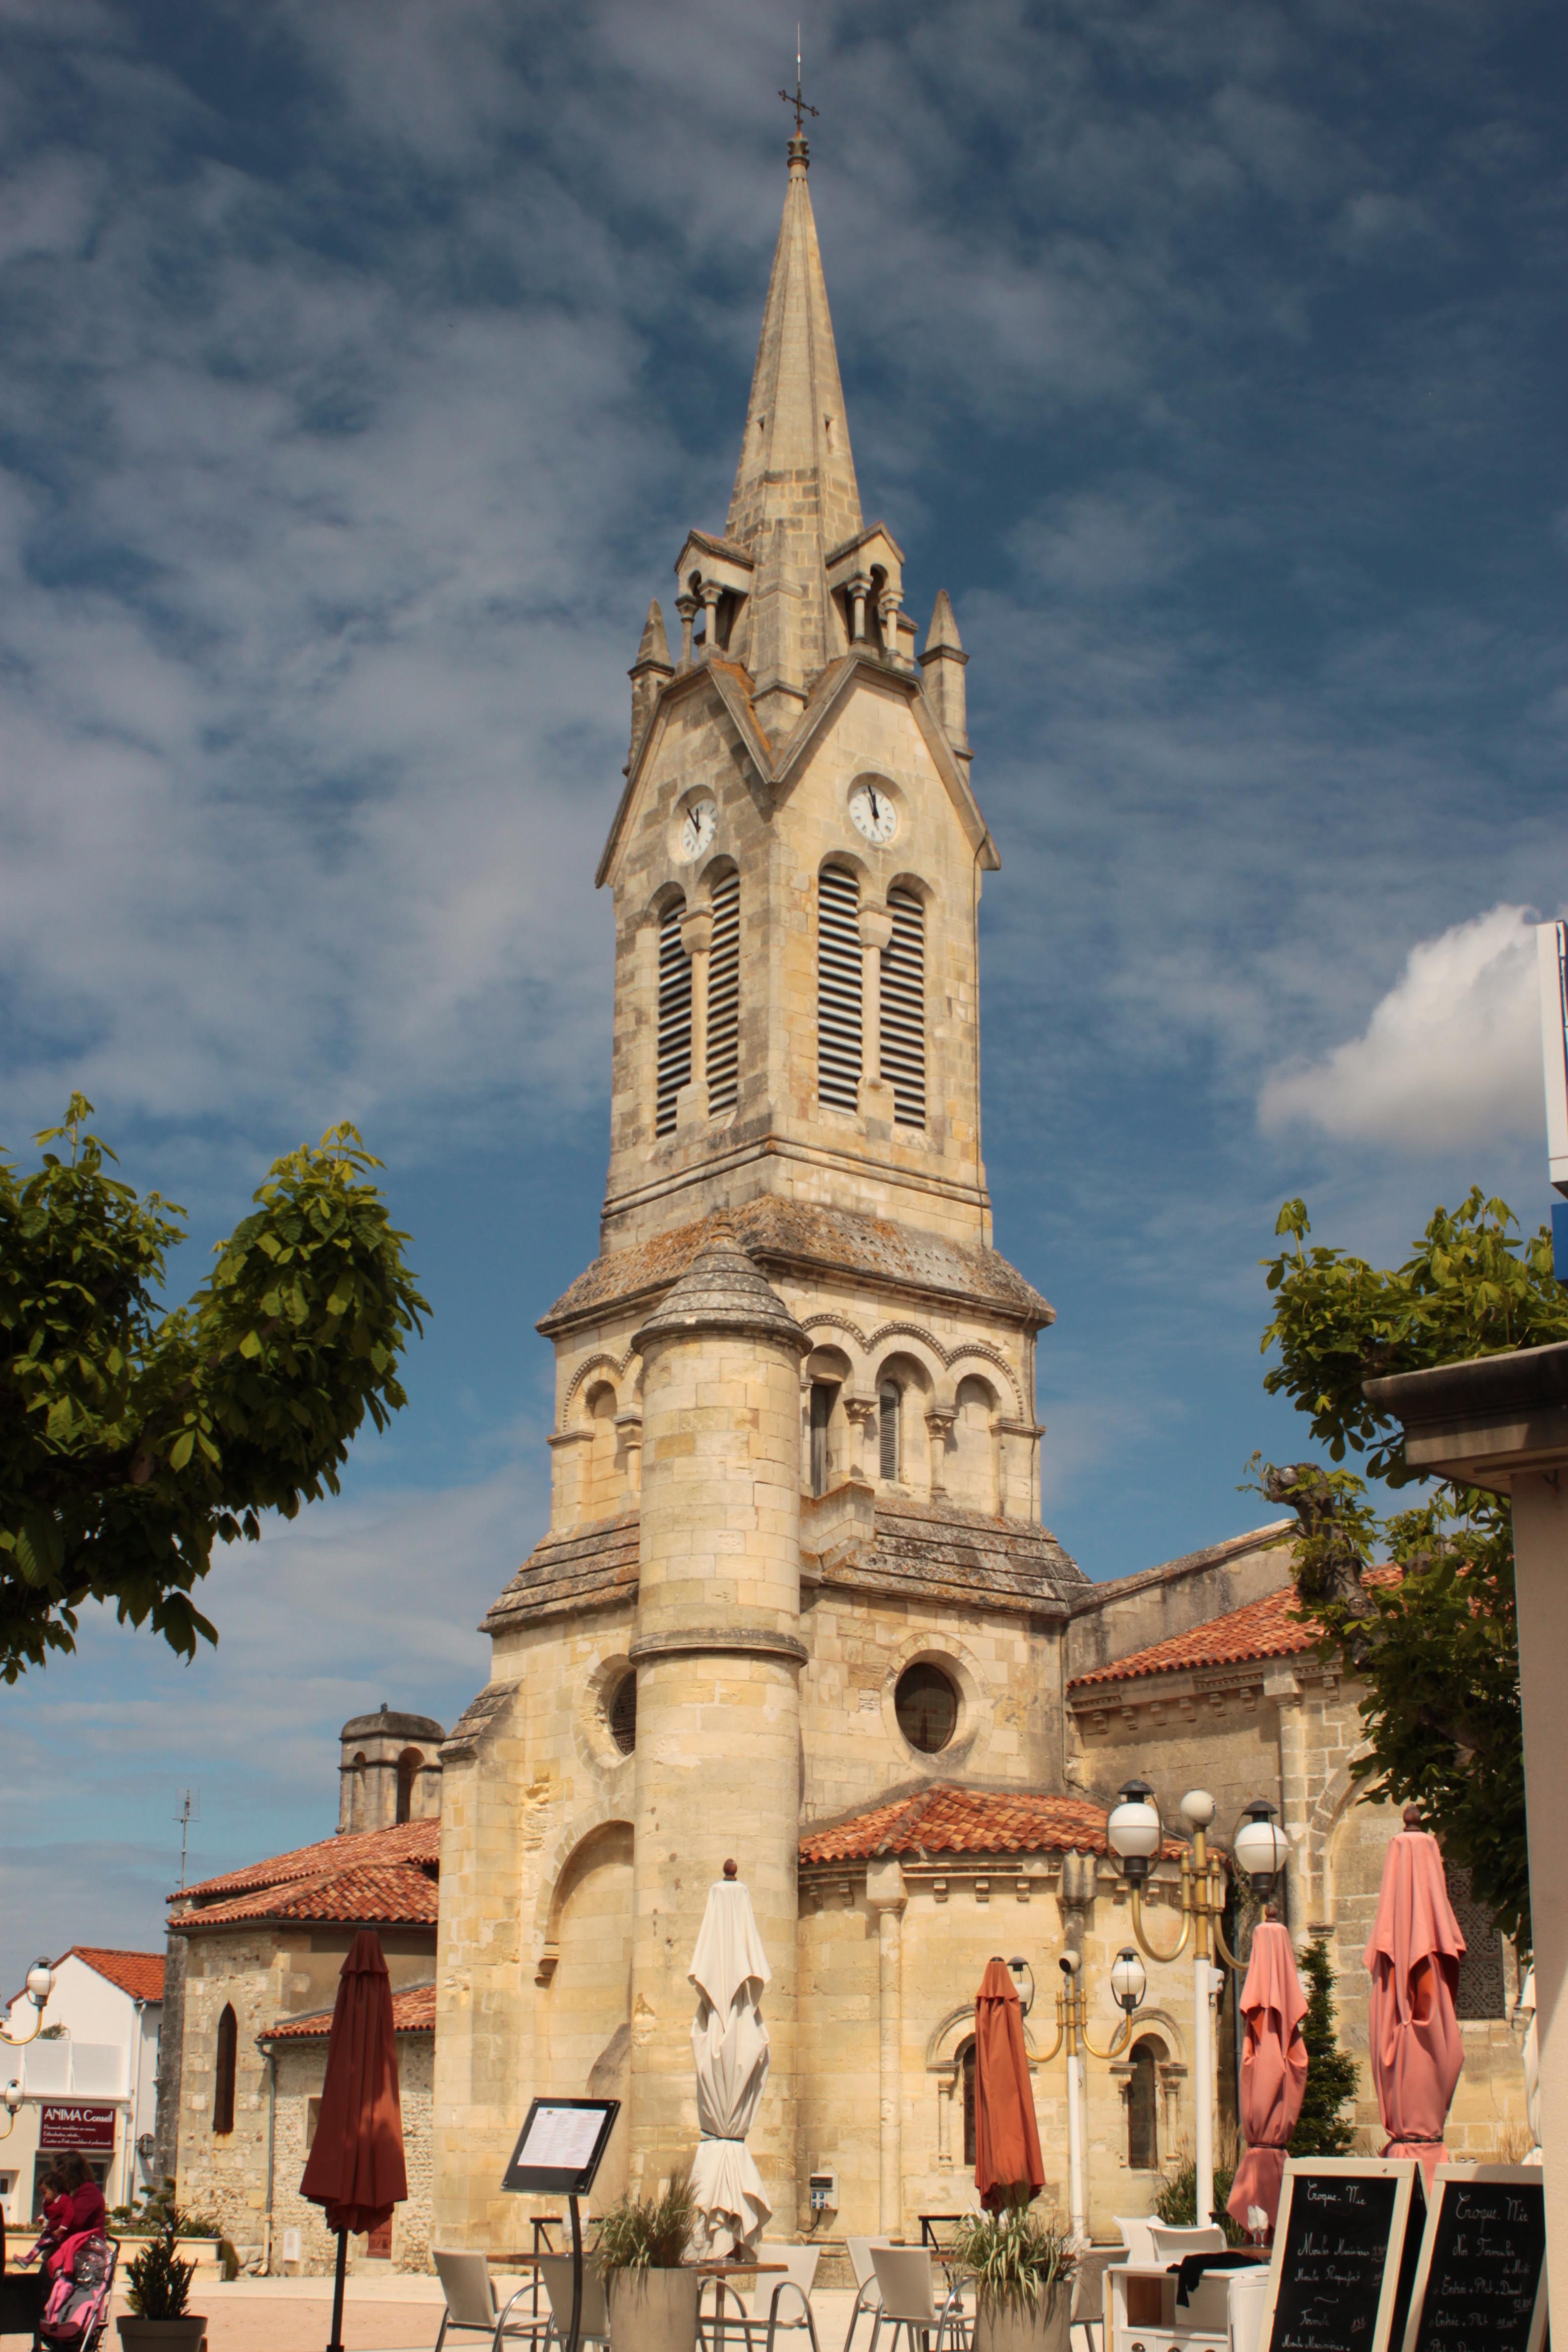 Anima Conseil Saint Georges De Didonne file:w0699-stgeorgesdedidonne stgeorges 64739